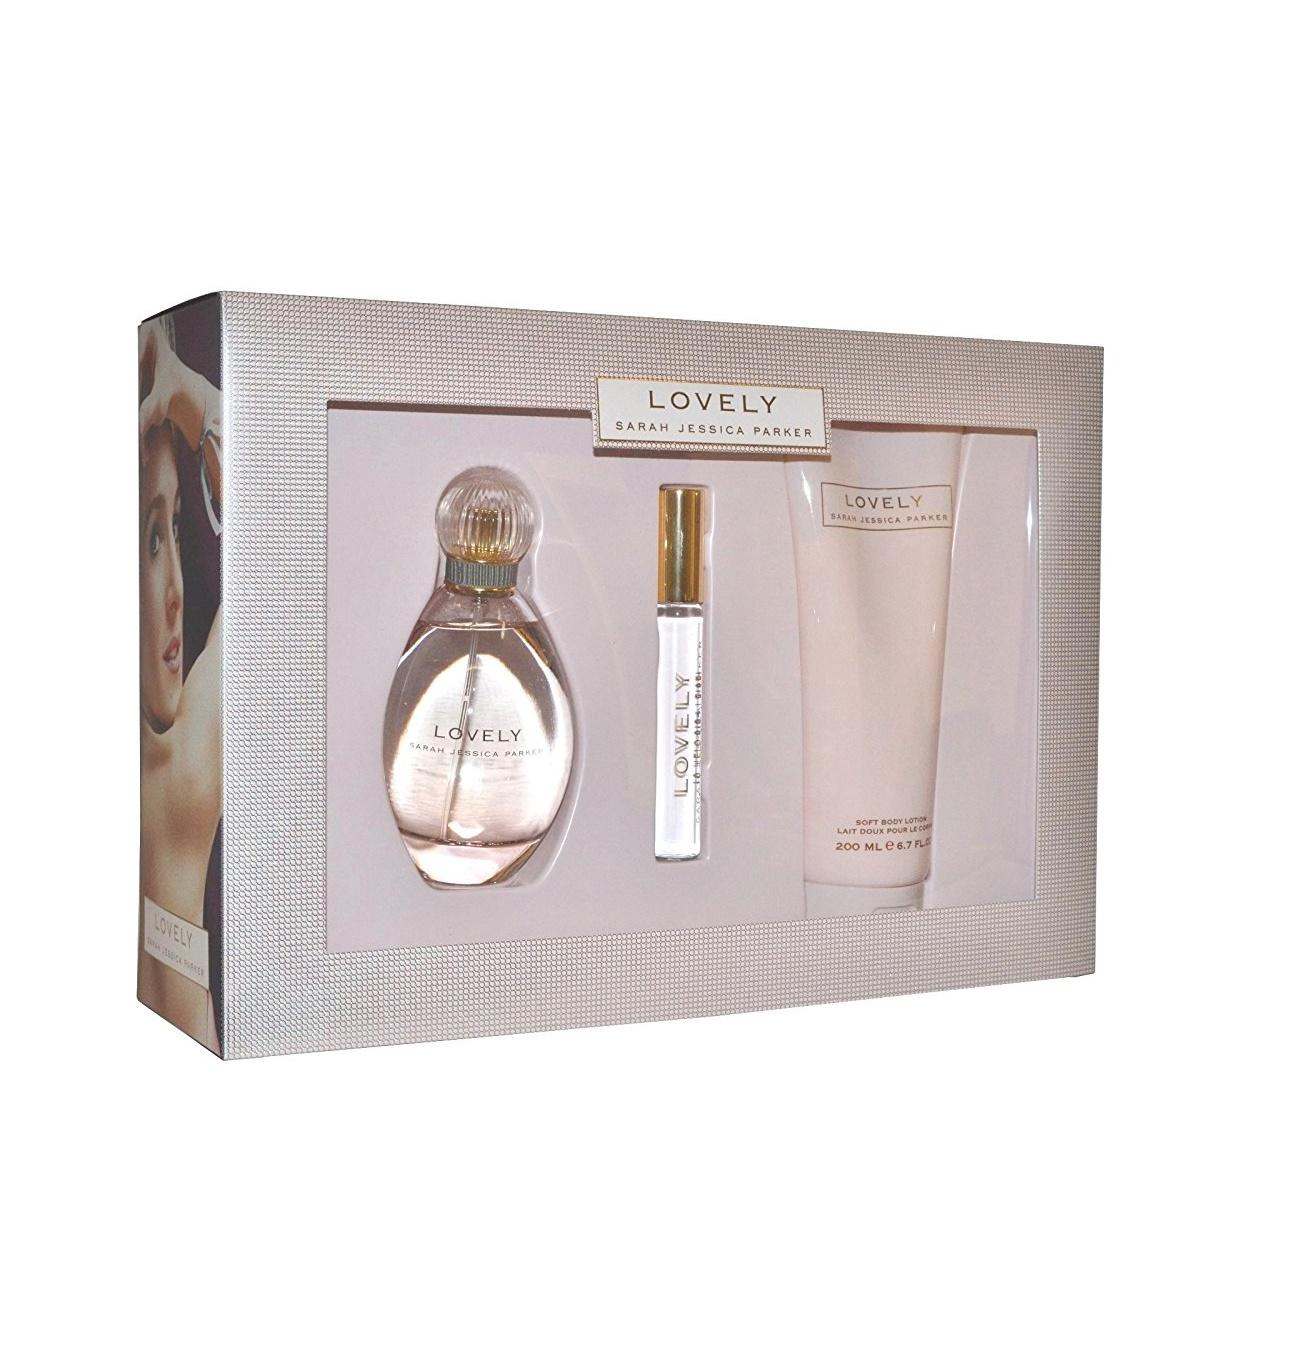 LOVELY Sarah Jessica Parker 34 Oz EDP 67 Lotion Rollerball Women Perfume SET